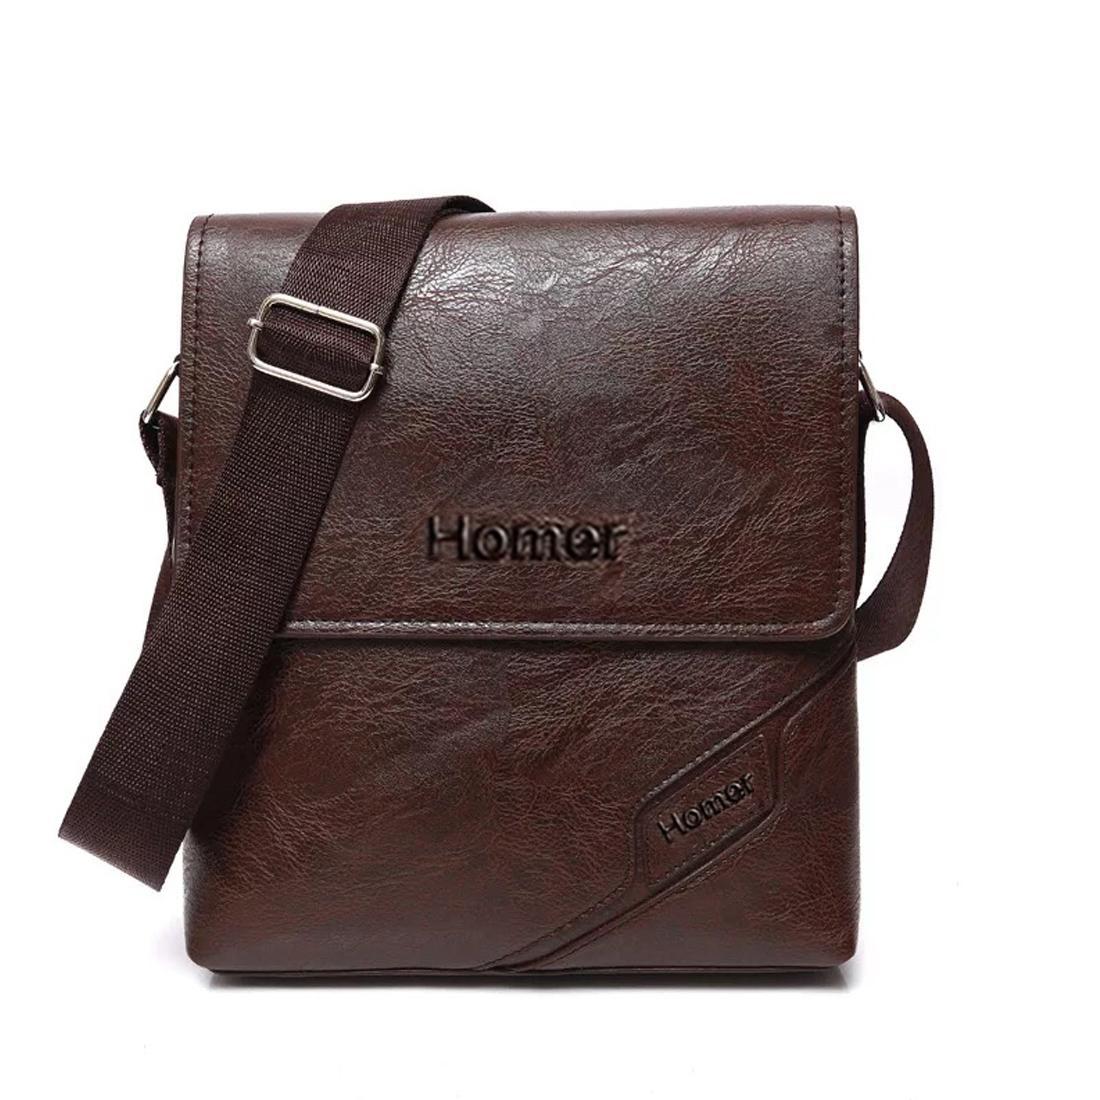 Moys Homer Fashion Flashed Plain CrossBody Bag